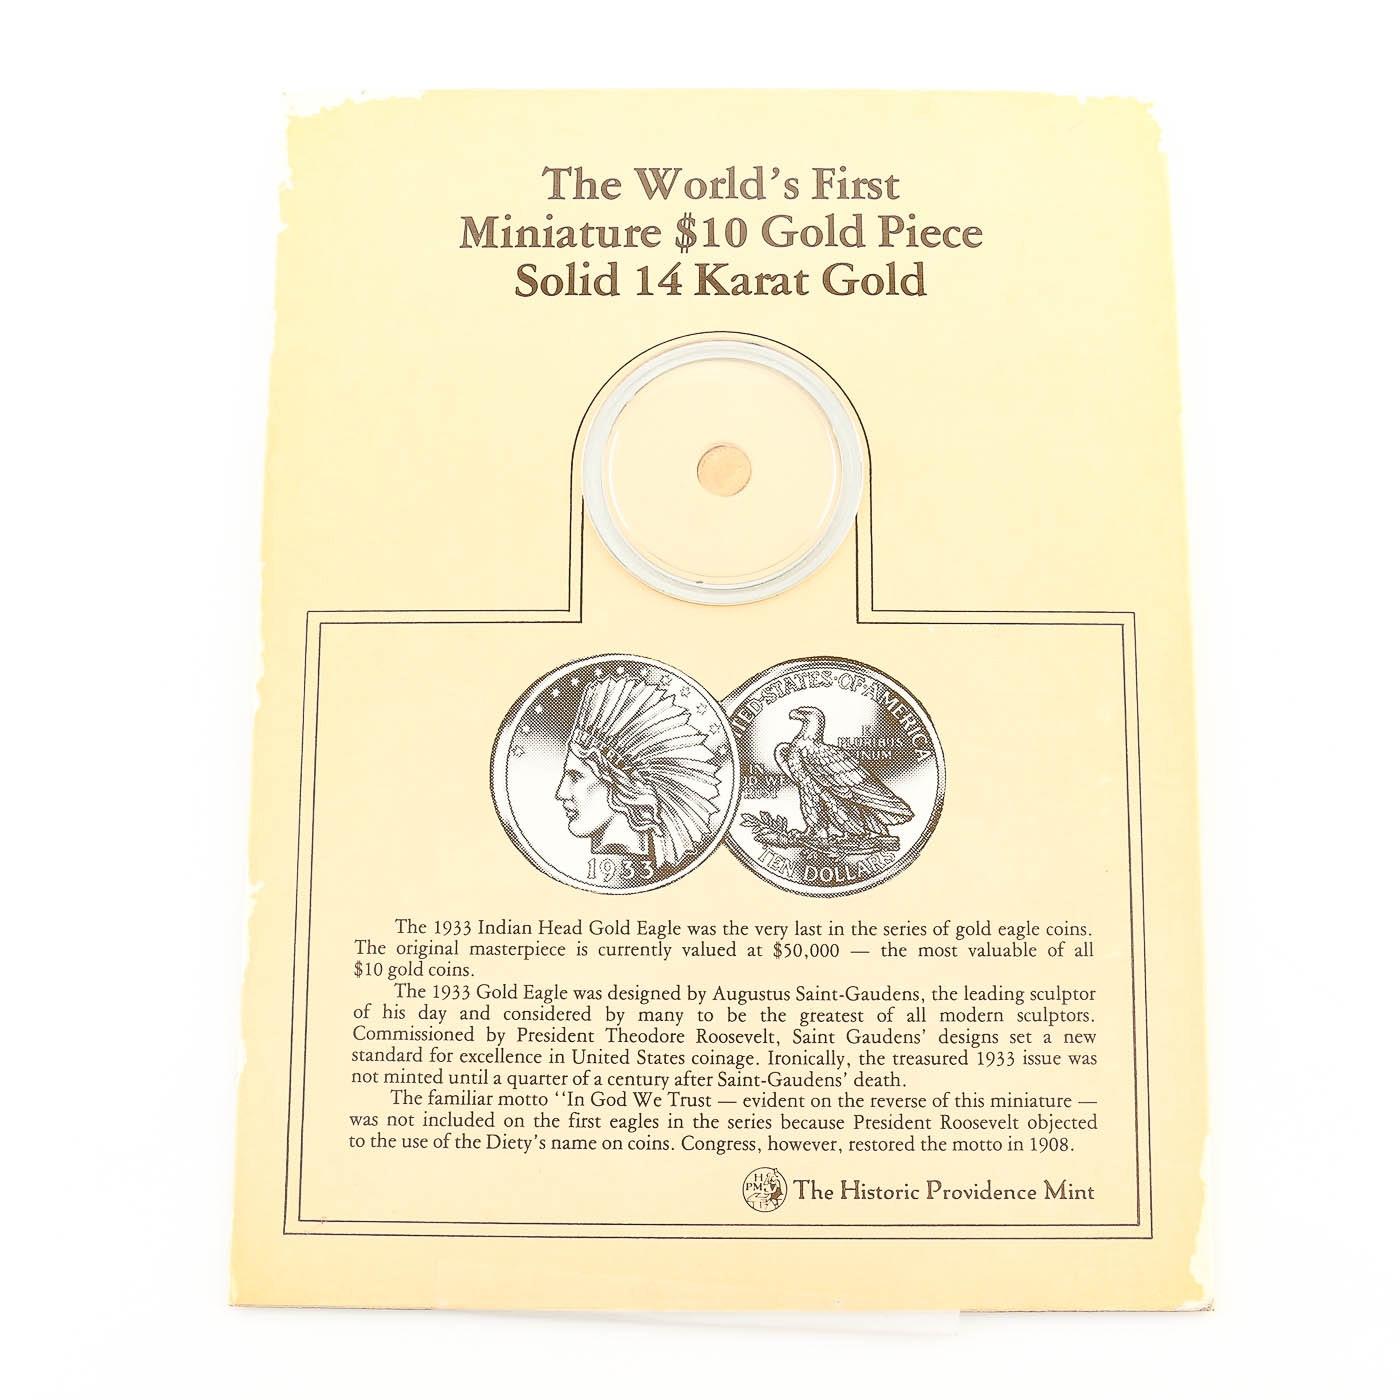 Miniature Replica $10 Indian Head 14 Karat Gold Eagle